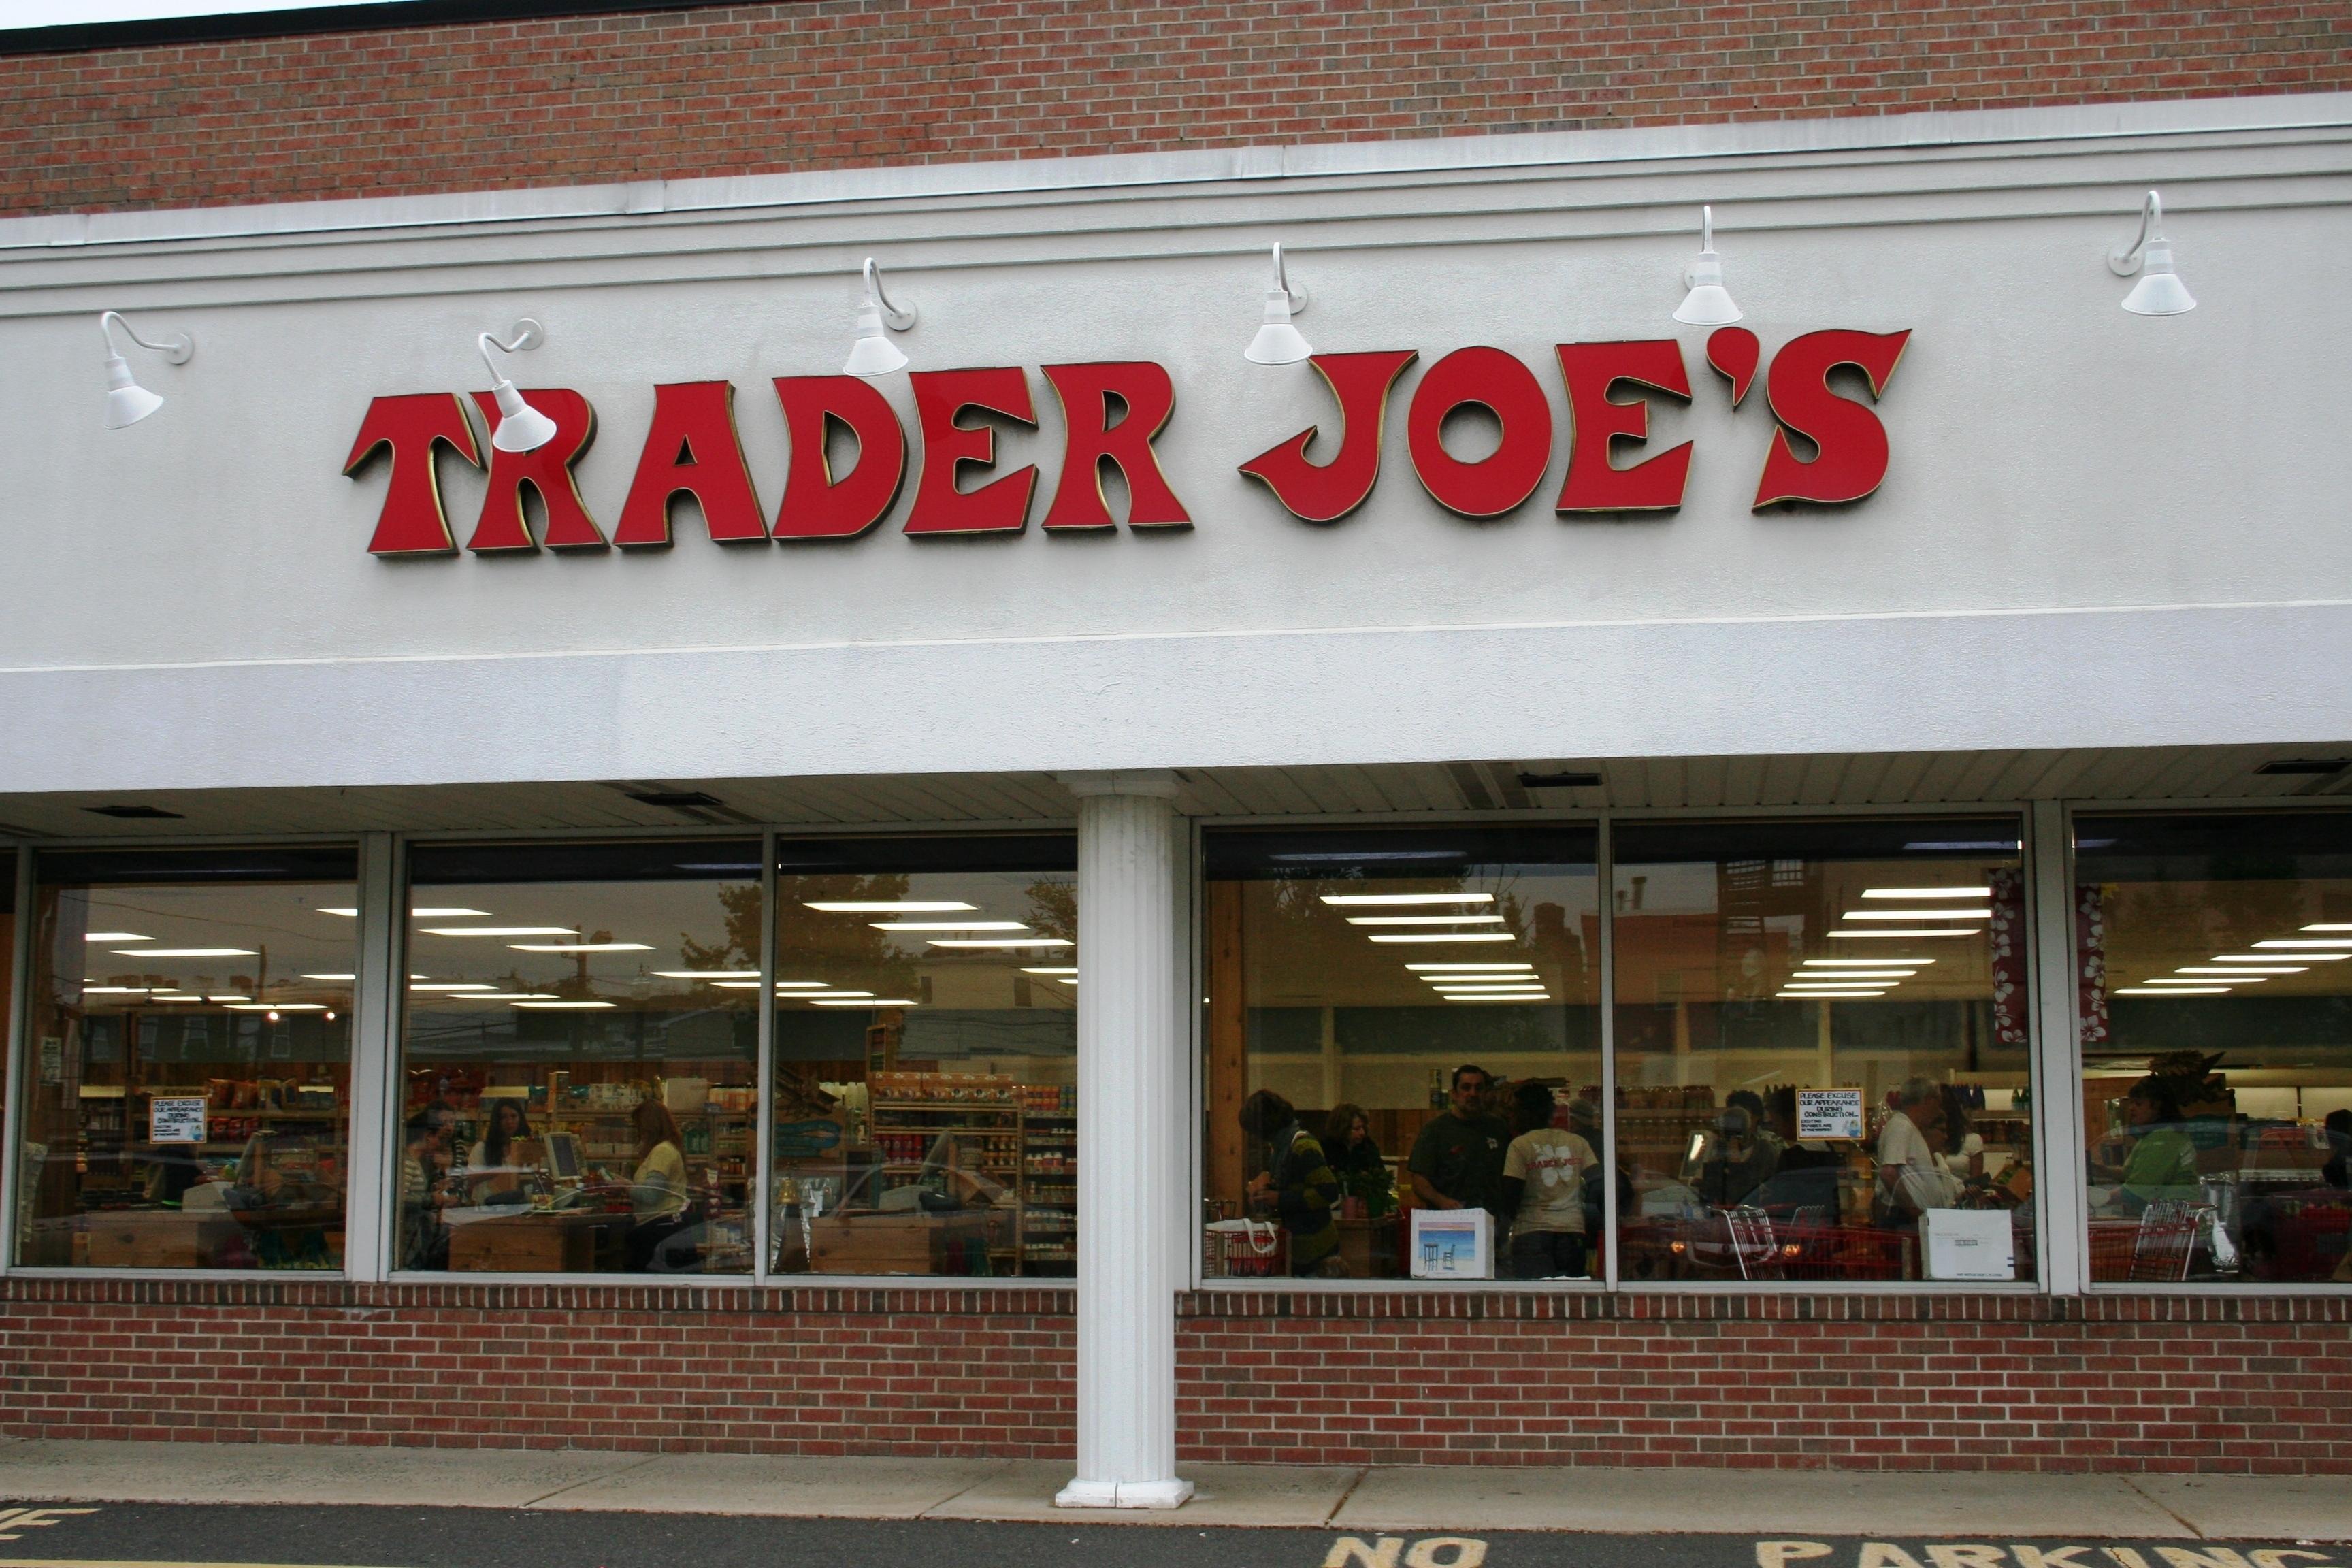 3be79b385dbd0c859e82_Trader_Joe.JPG